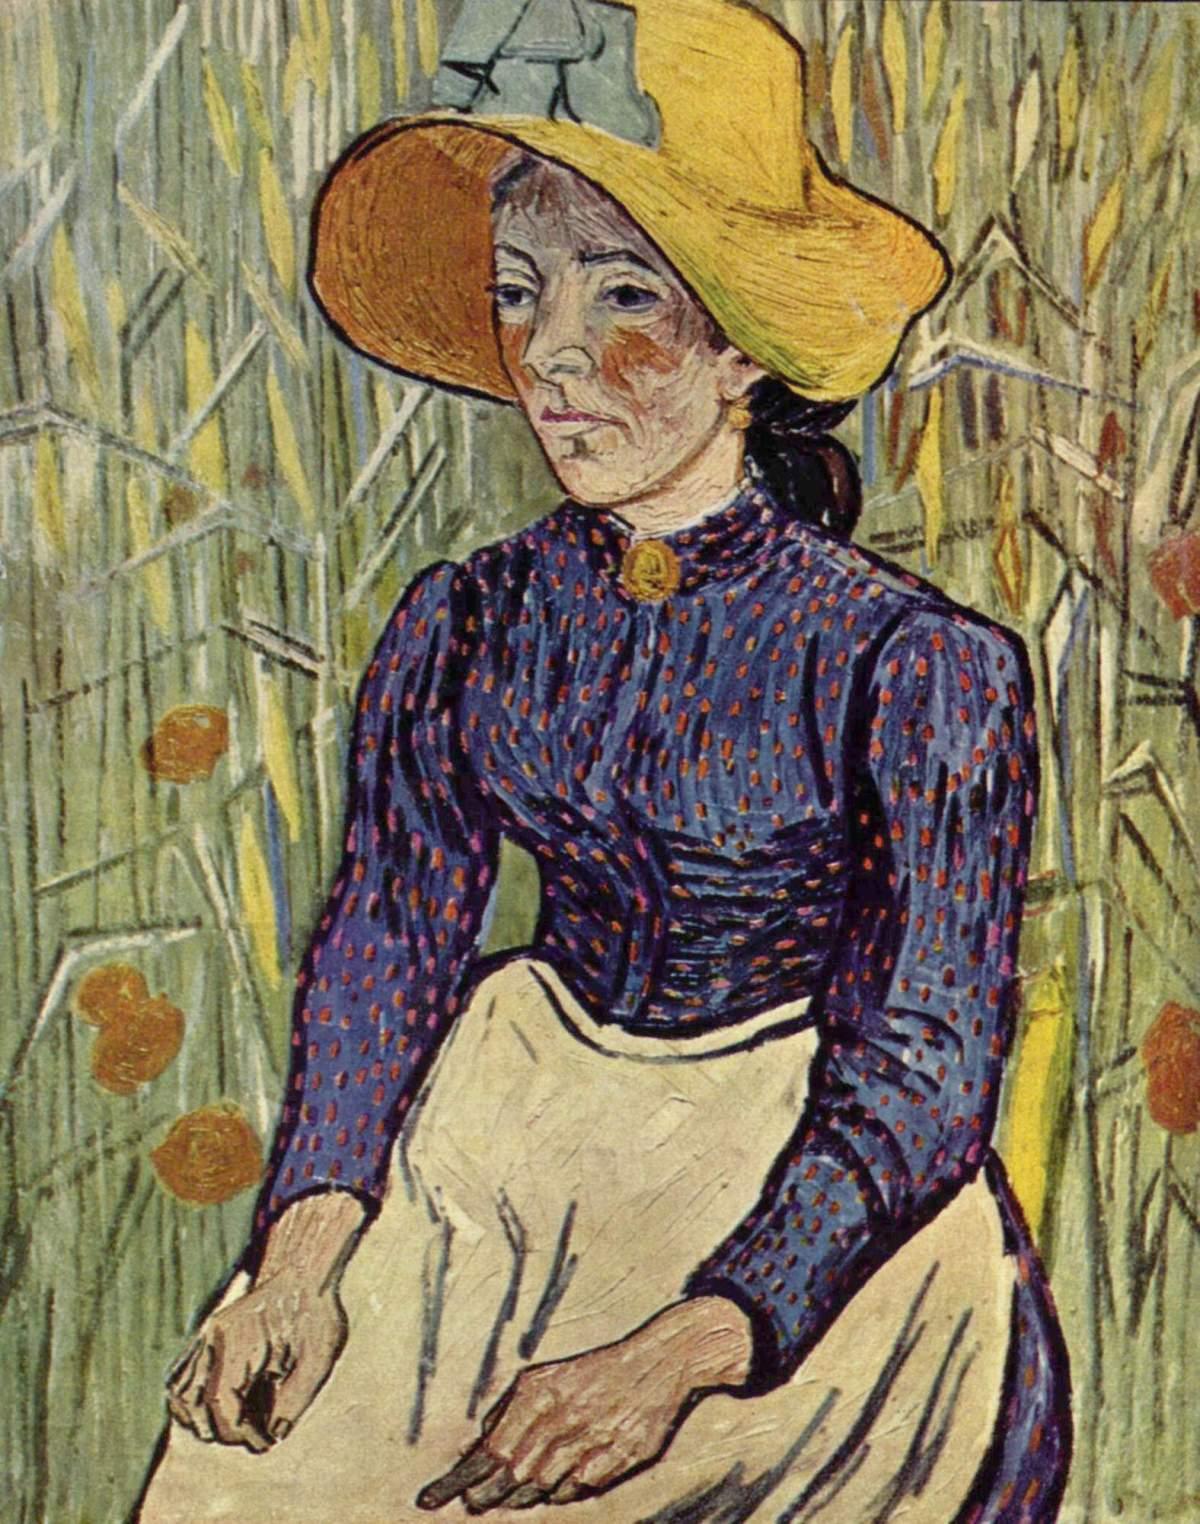 Vincent_Willem_van_Gogh_097